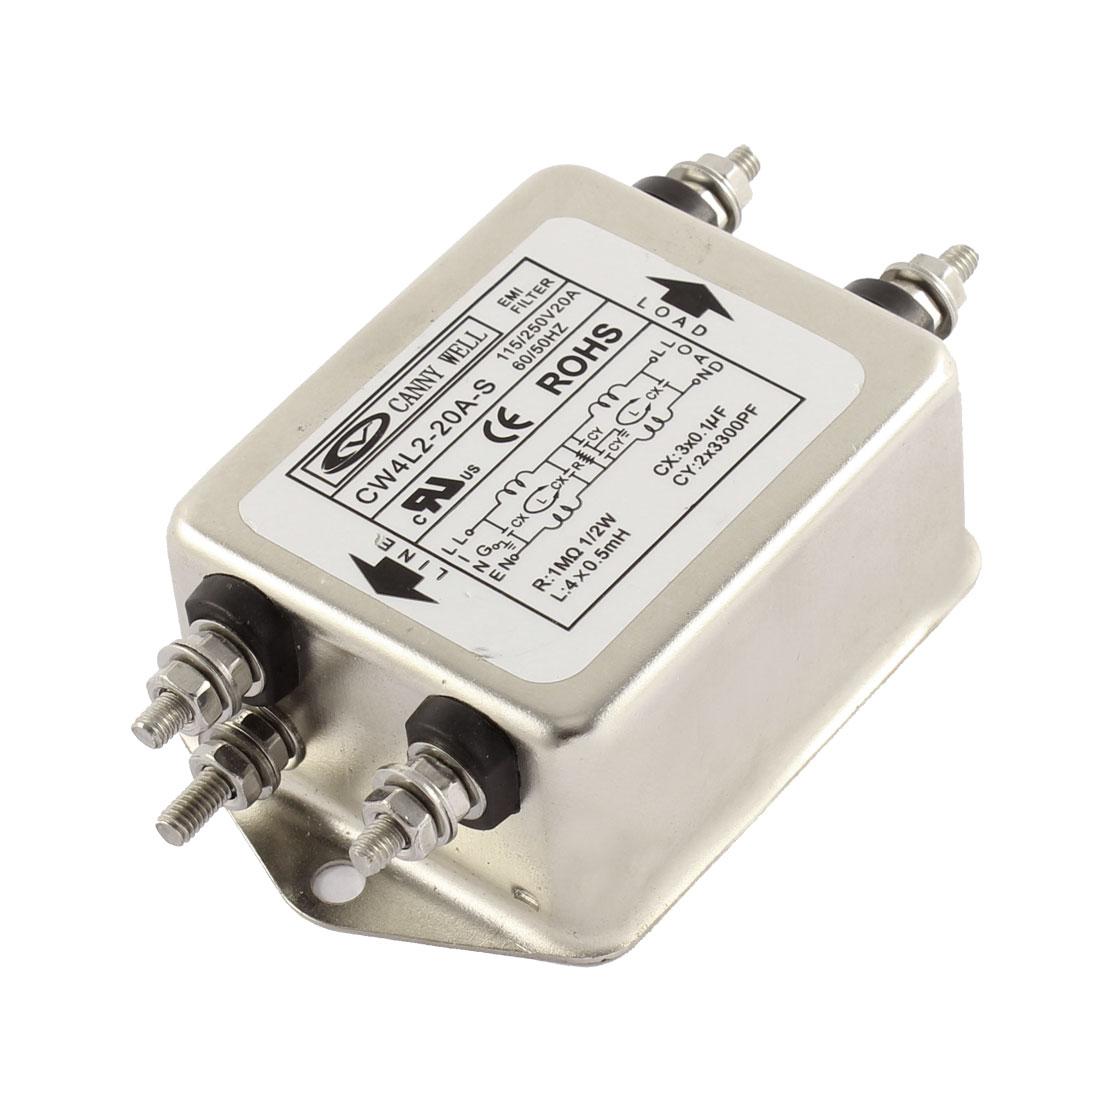 AC 115/250V 20A CW4L2-20A-S Noise Suppressor Power EMI Filter